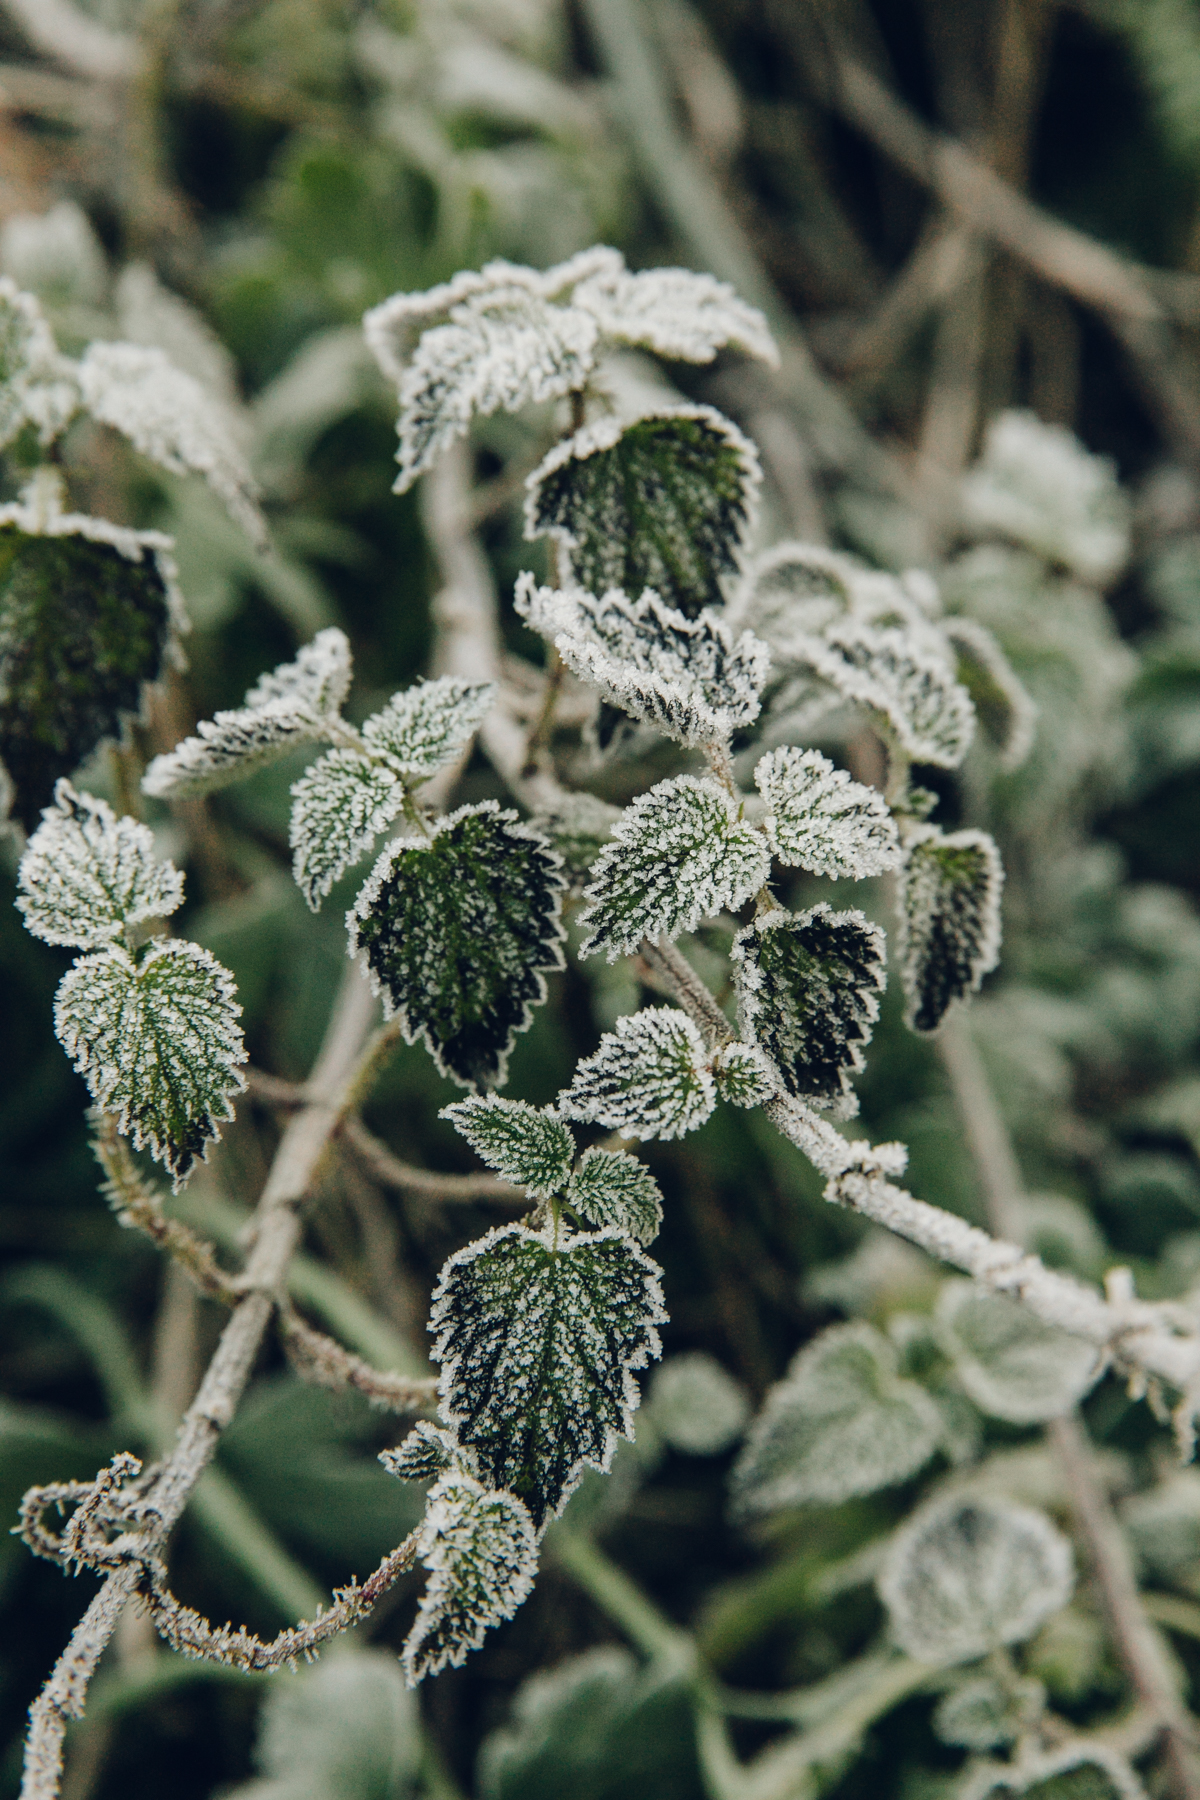 Frozen winter foliage.